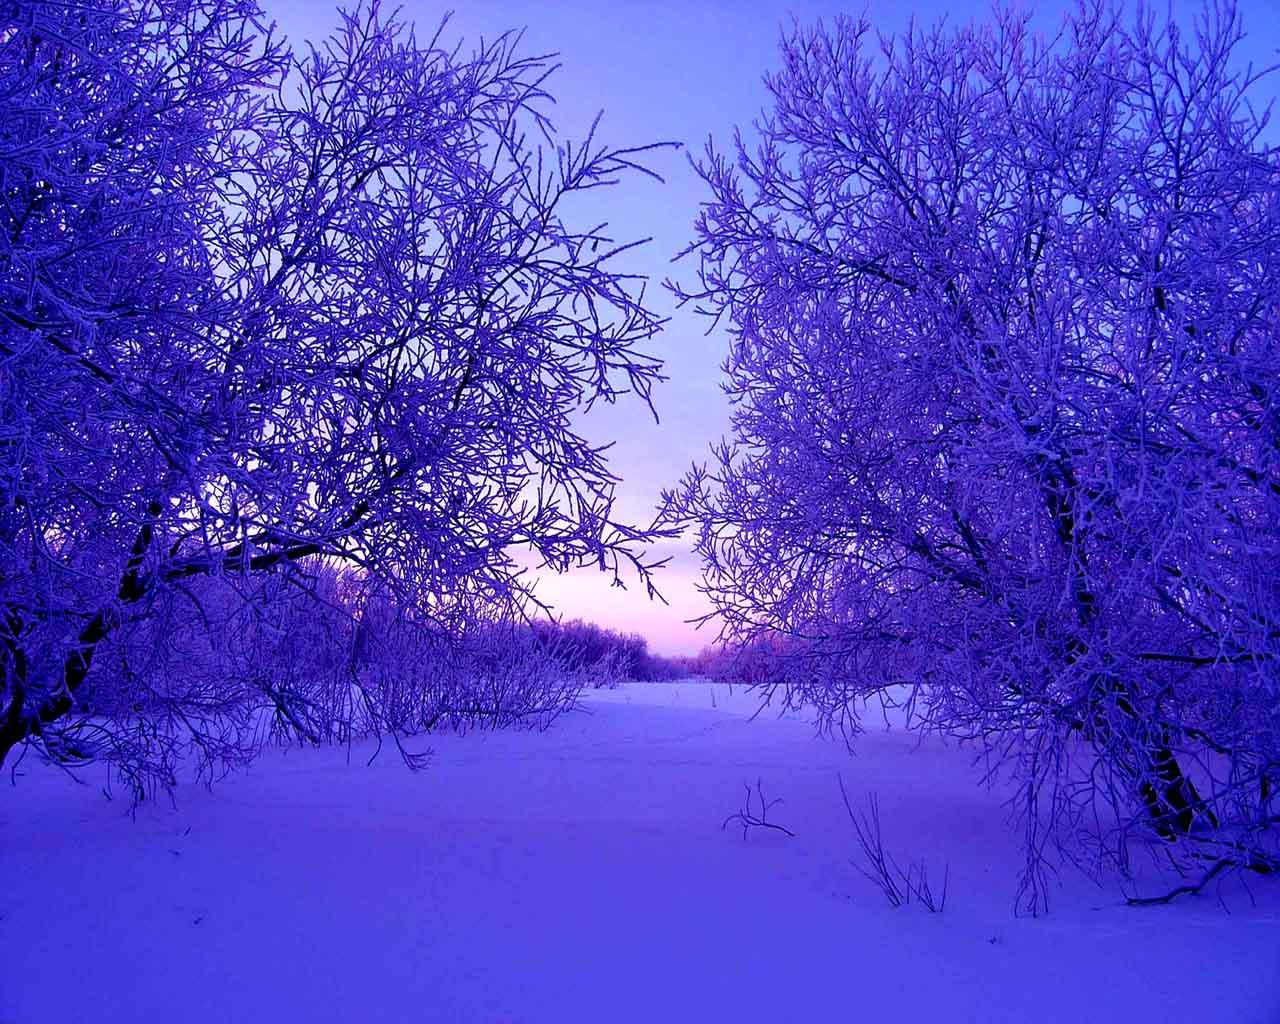 Winter wallpapers for Sfondi invernali hd